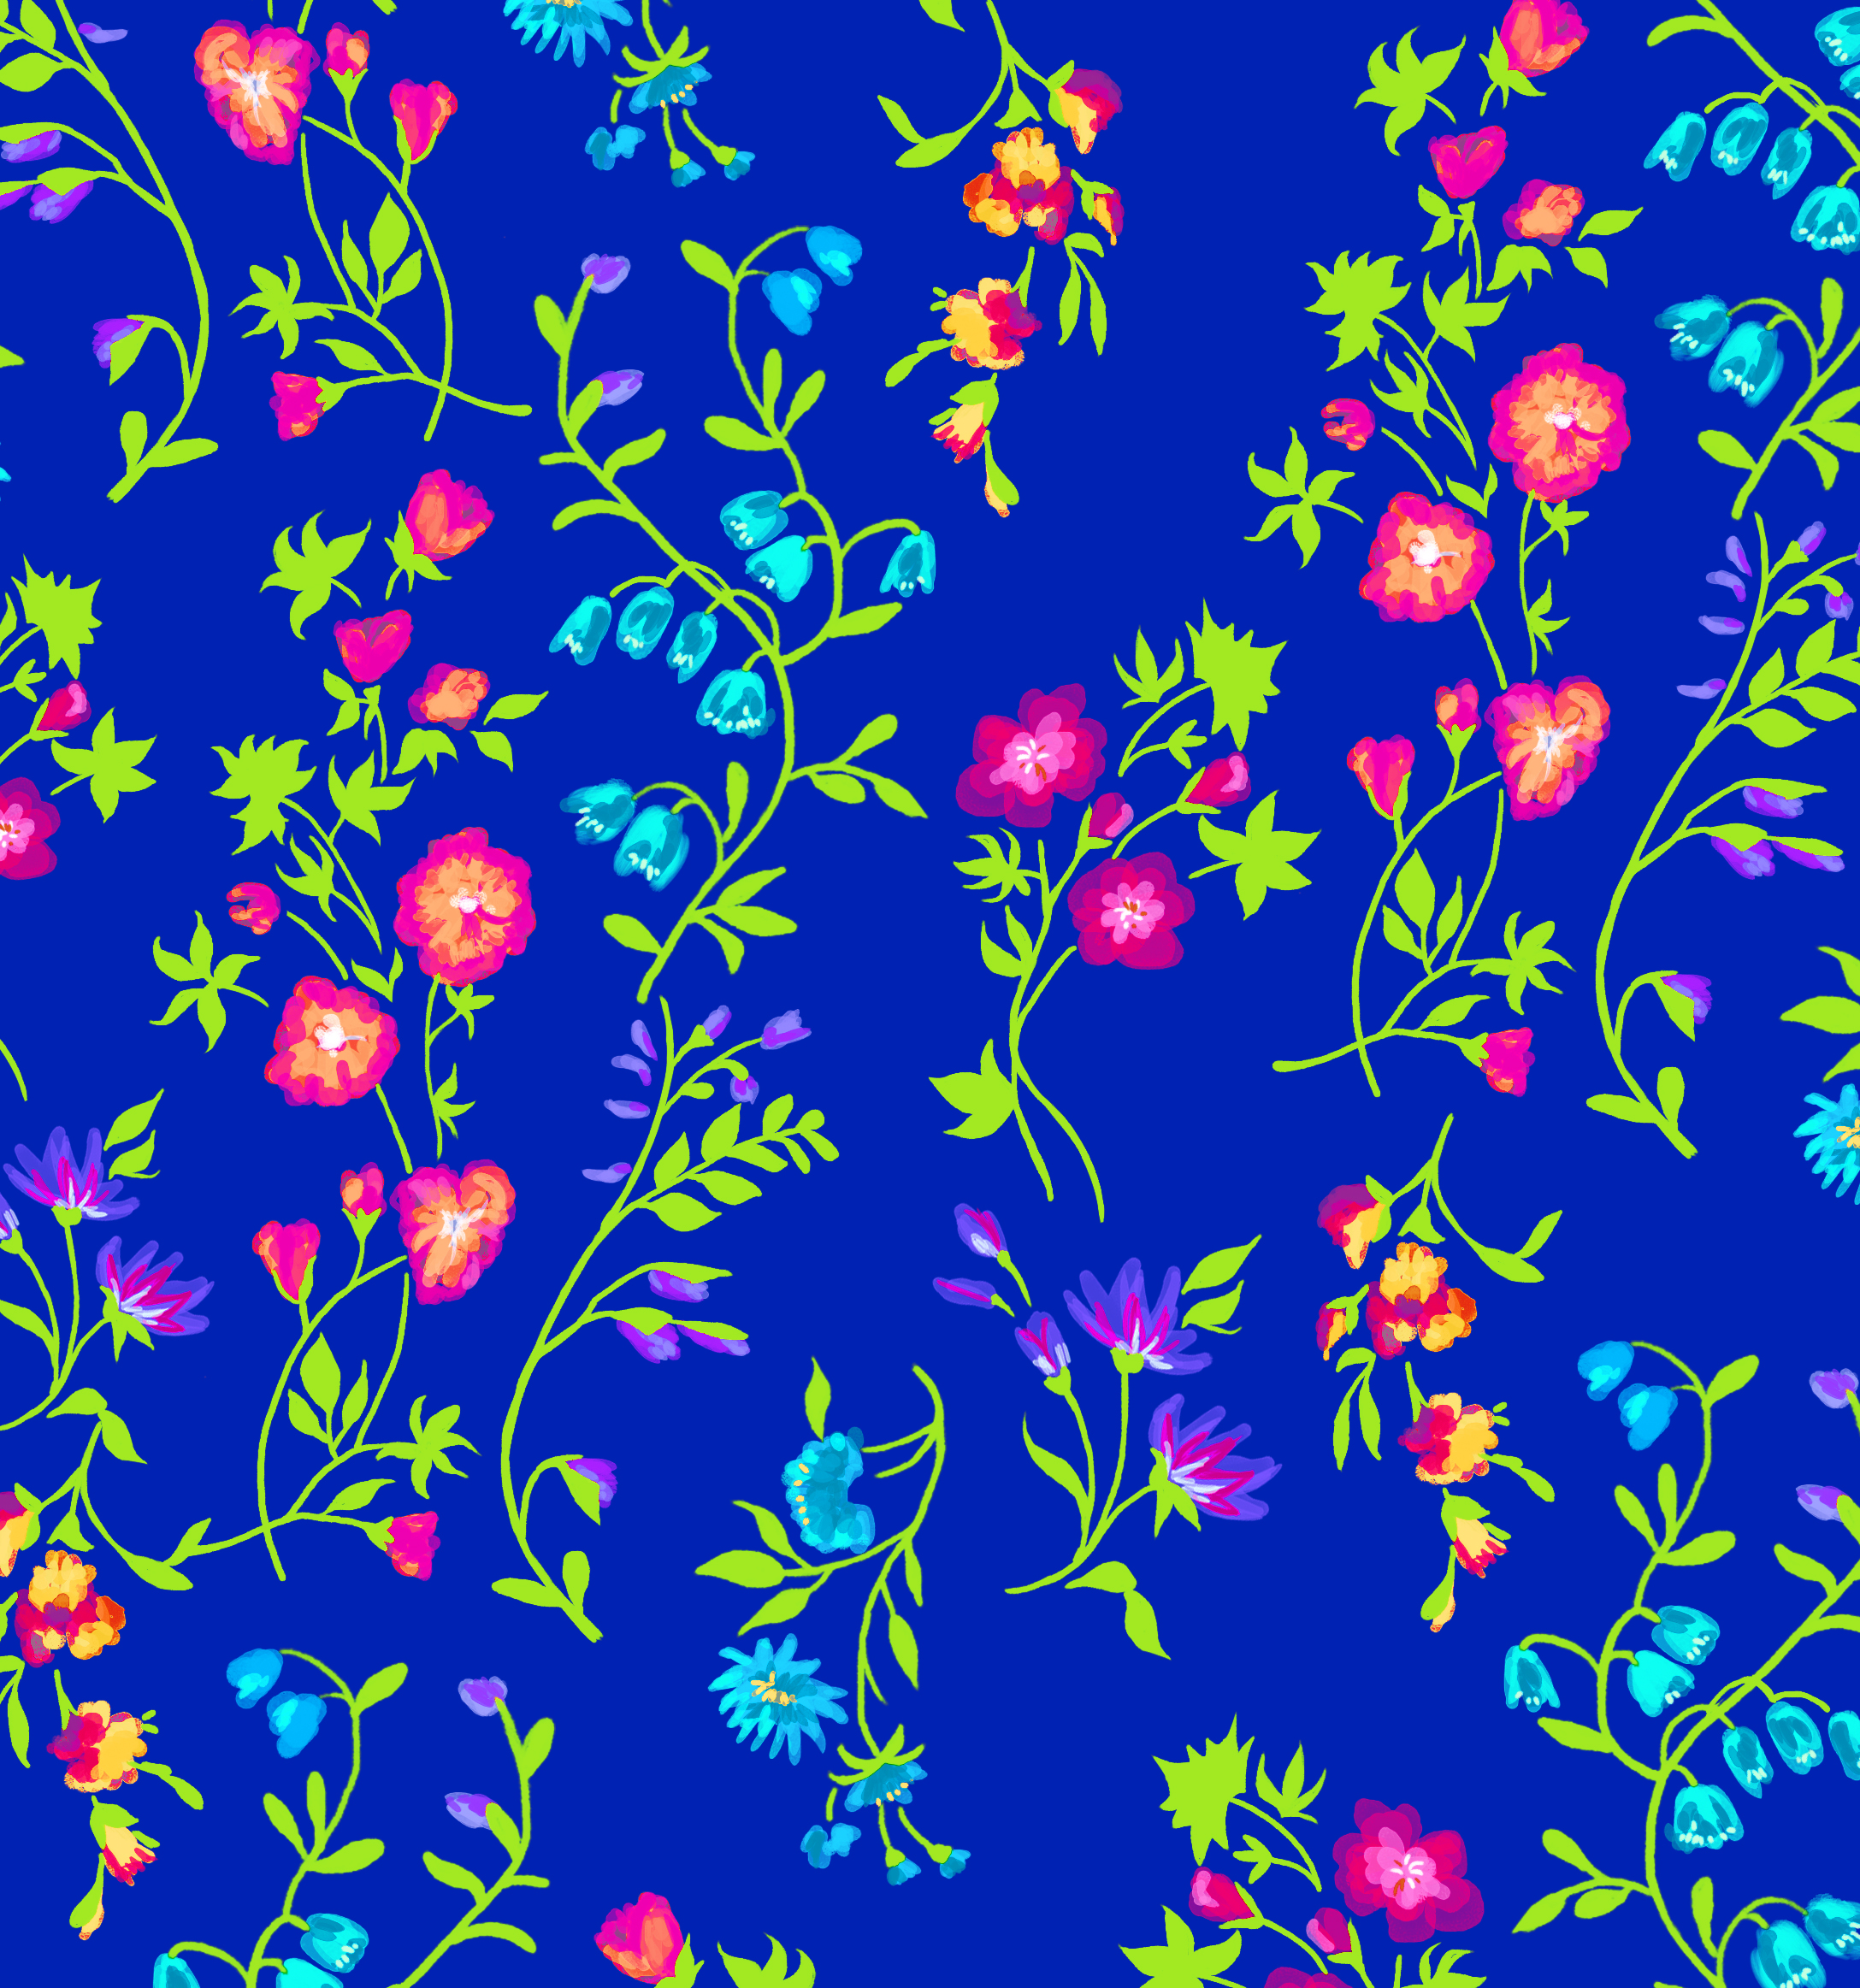 floral pattern navy.jpg